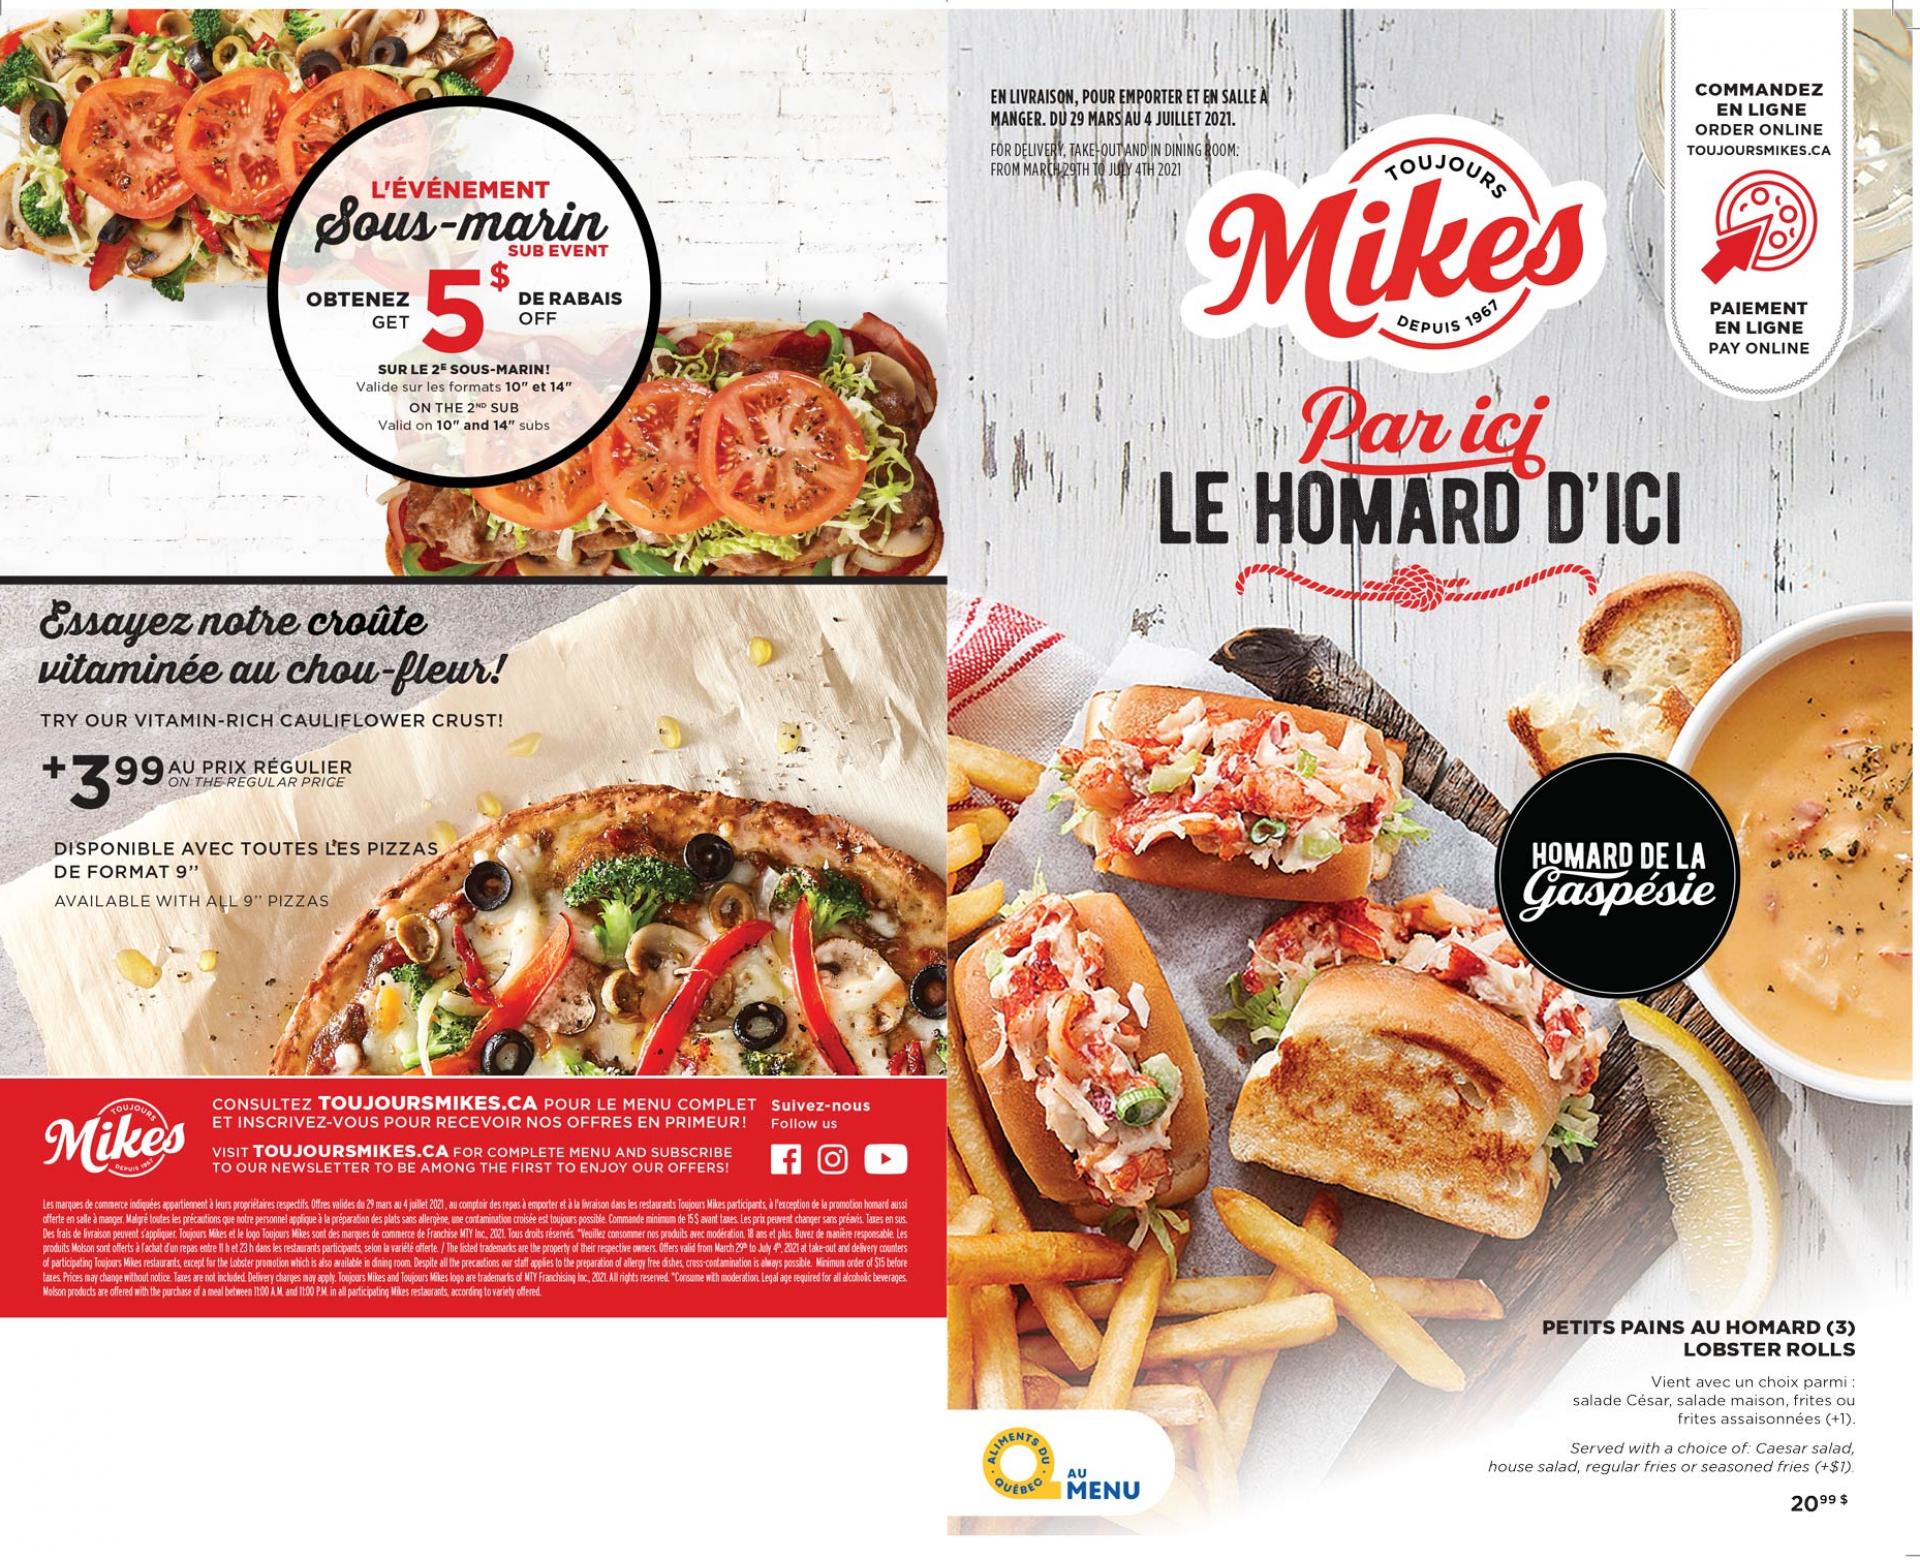 menu-promo-mikes-st-jerome-avril-2021-1.png